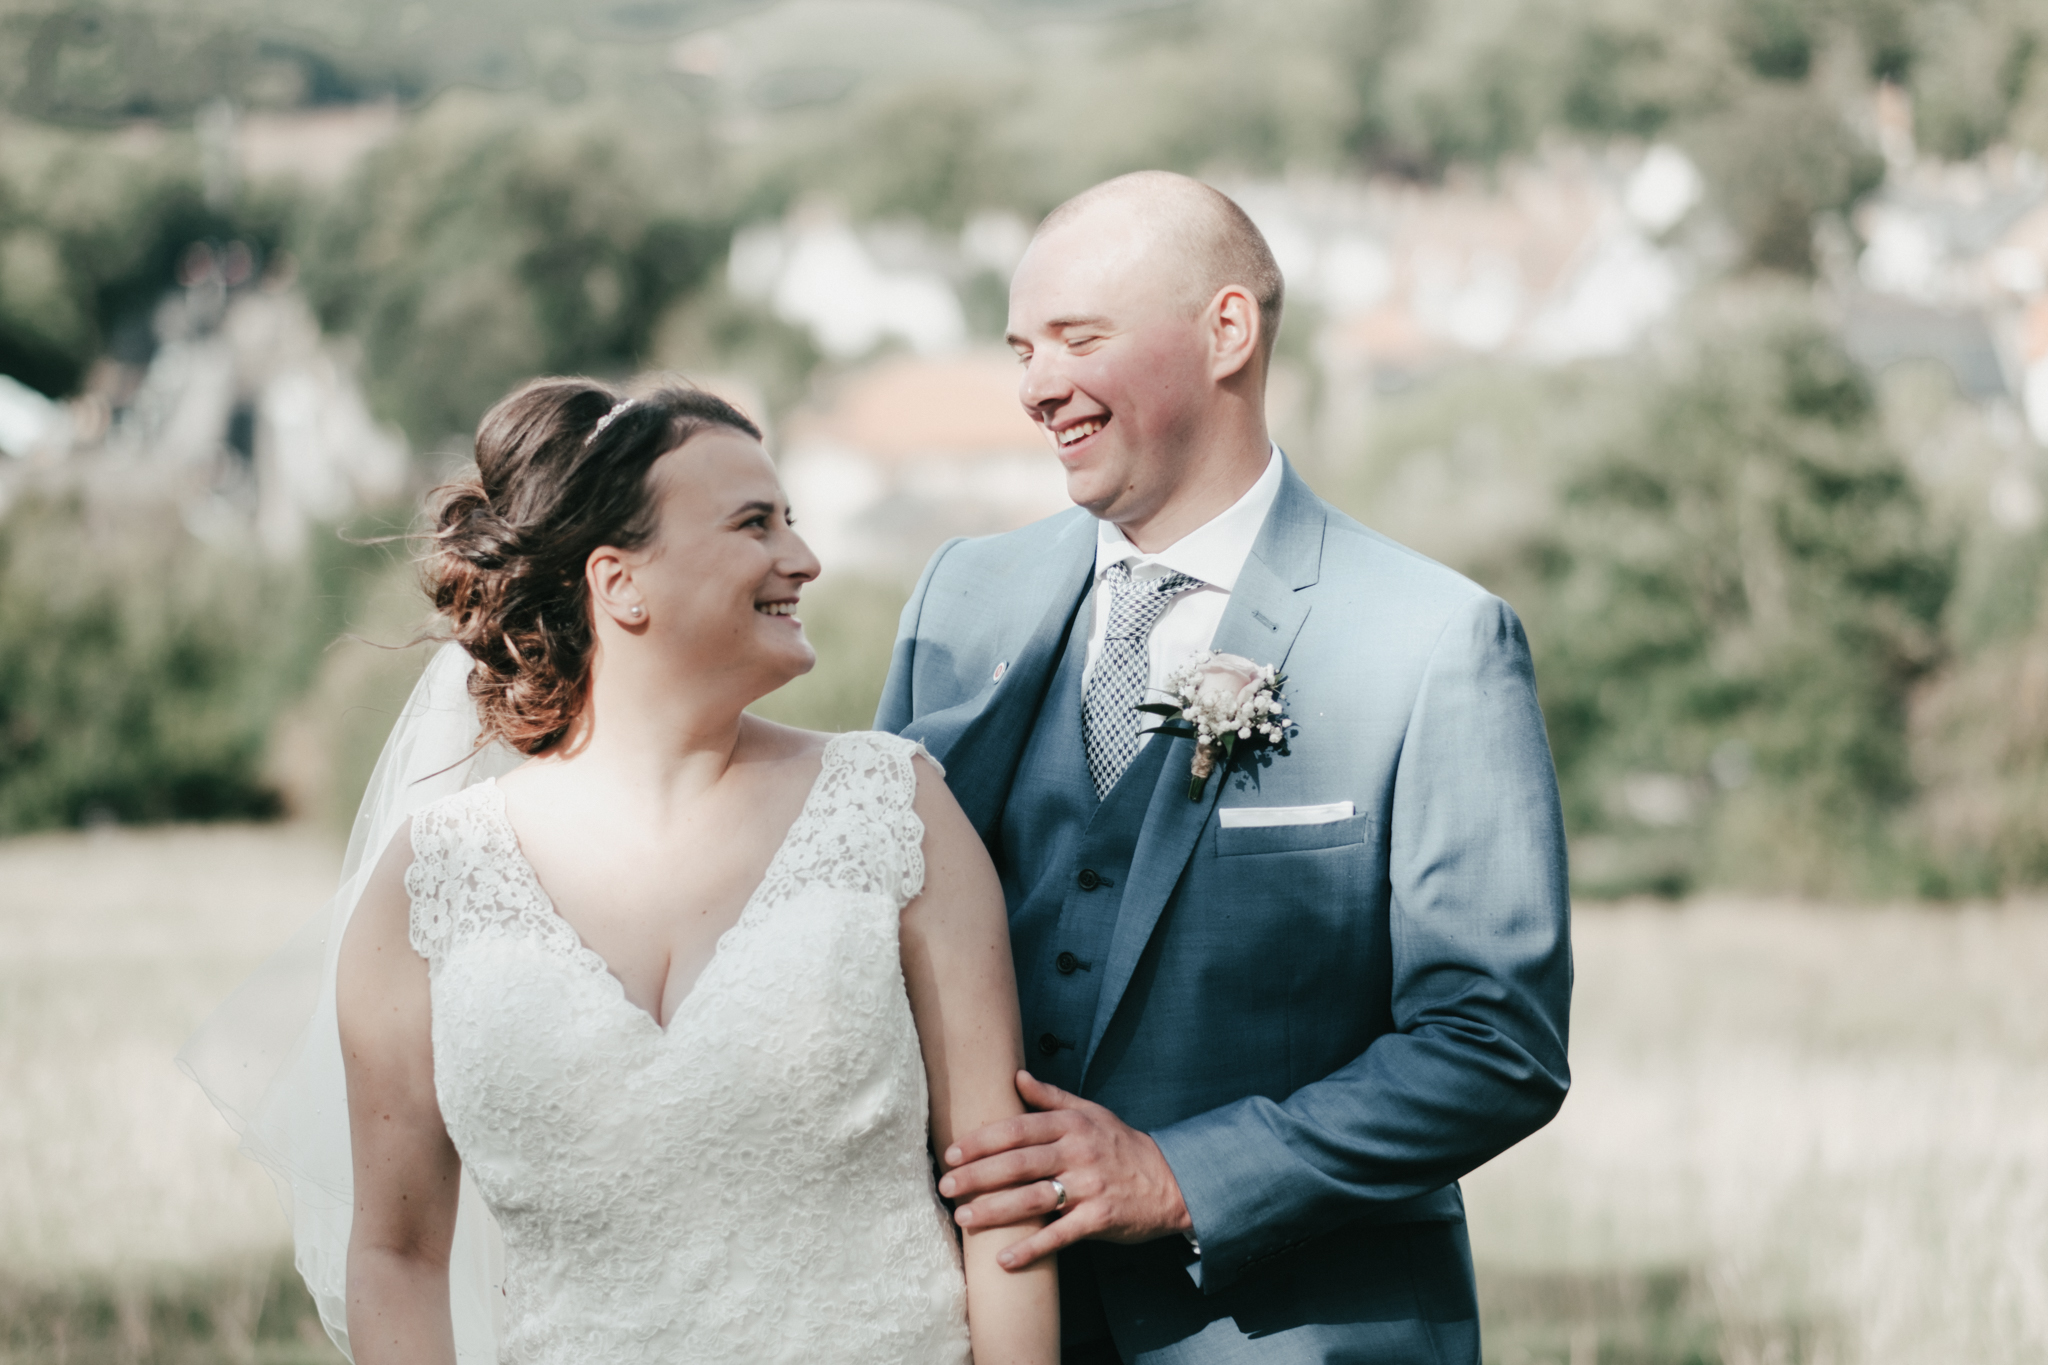 James and Emmas Wedding Photography | Pickering - North Yorkshire Wedding Photographer